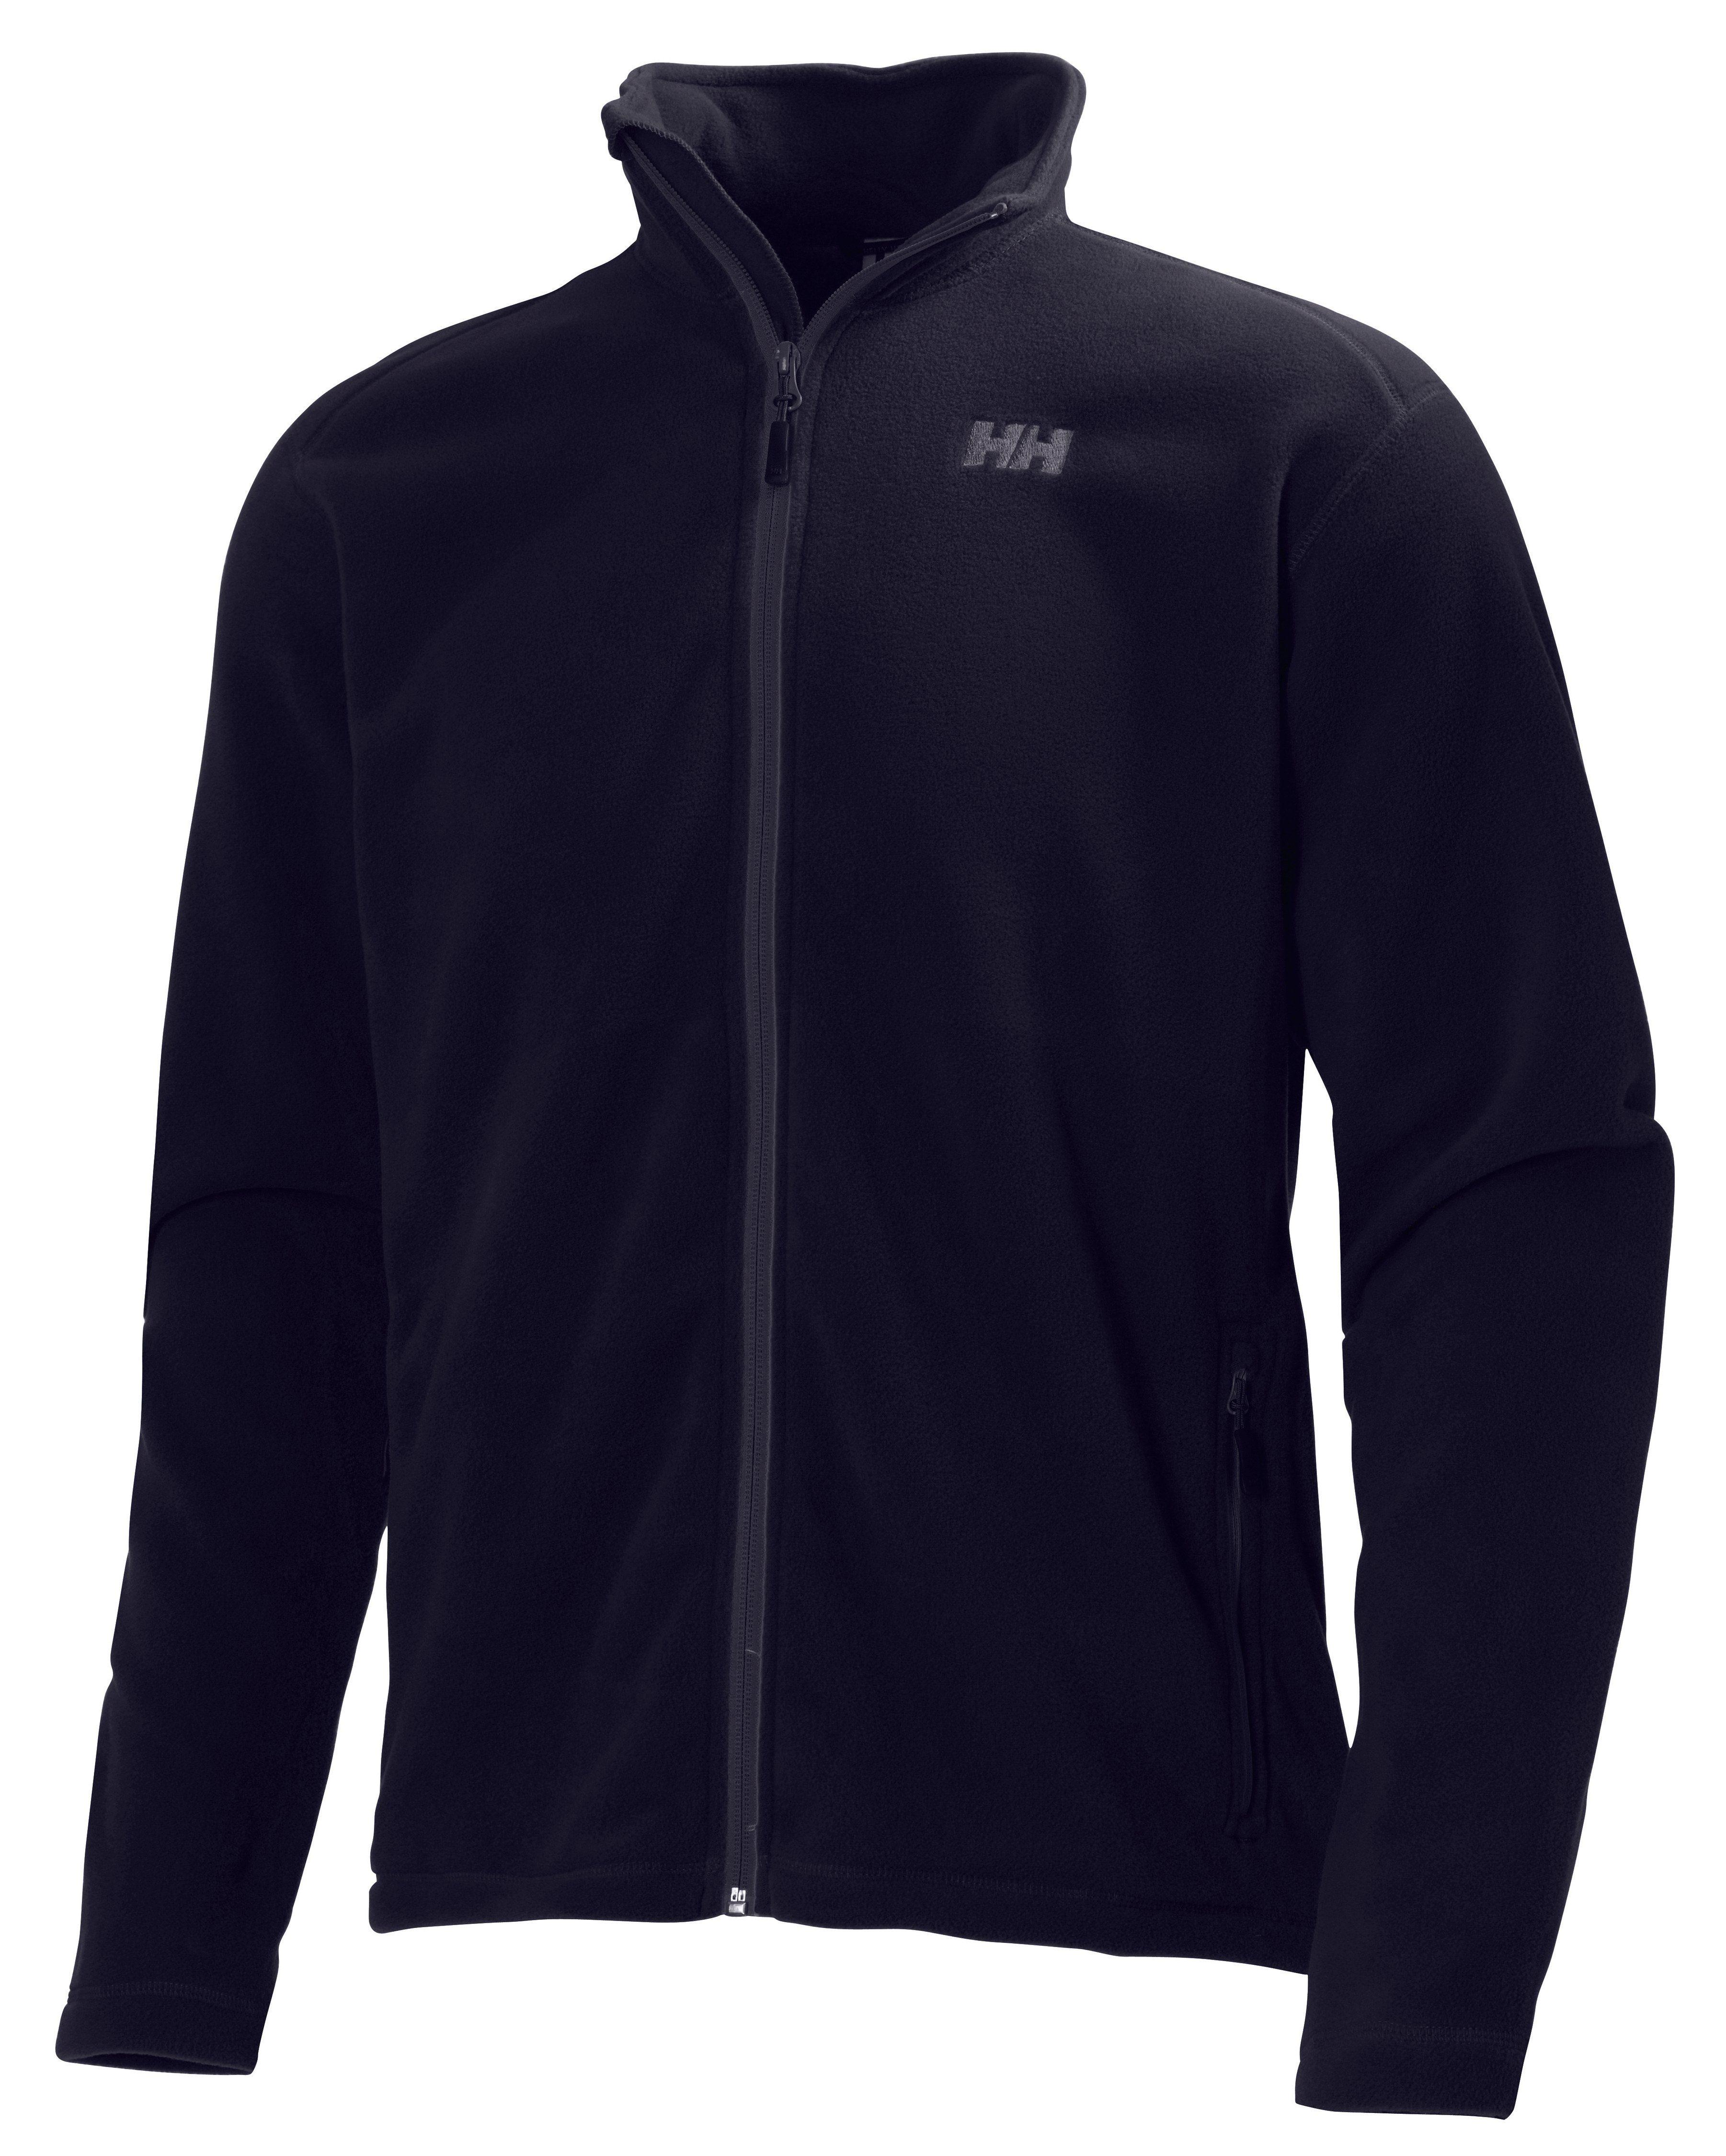 Helly Hansen Daybreaker Fleece Jacket | Bekleidung > Jacken > Fleecejacken | Blau | Baumwolle - Polyester | Helly Hansen